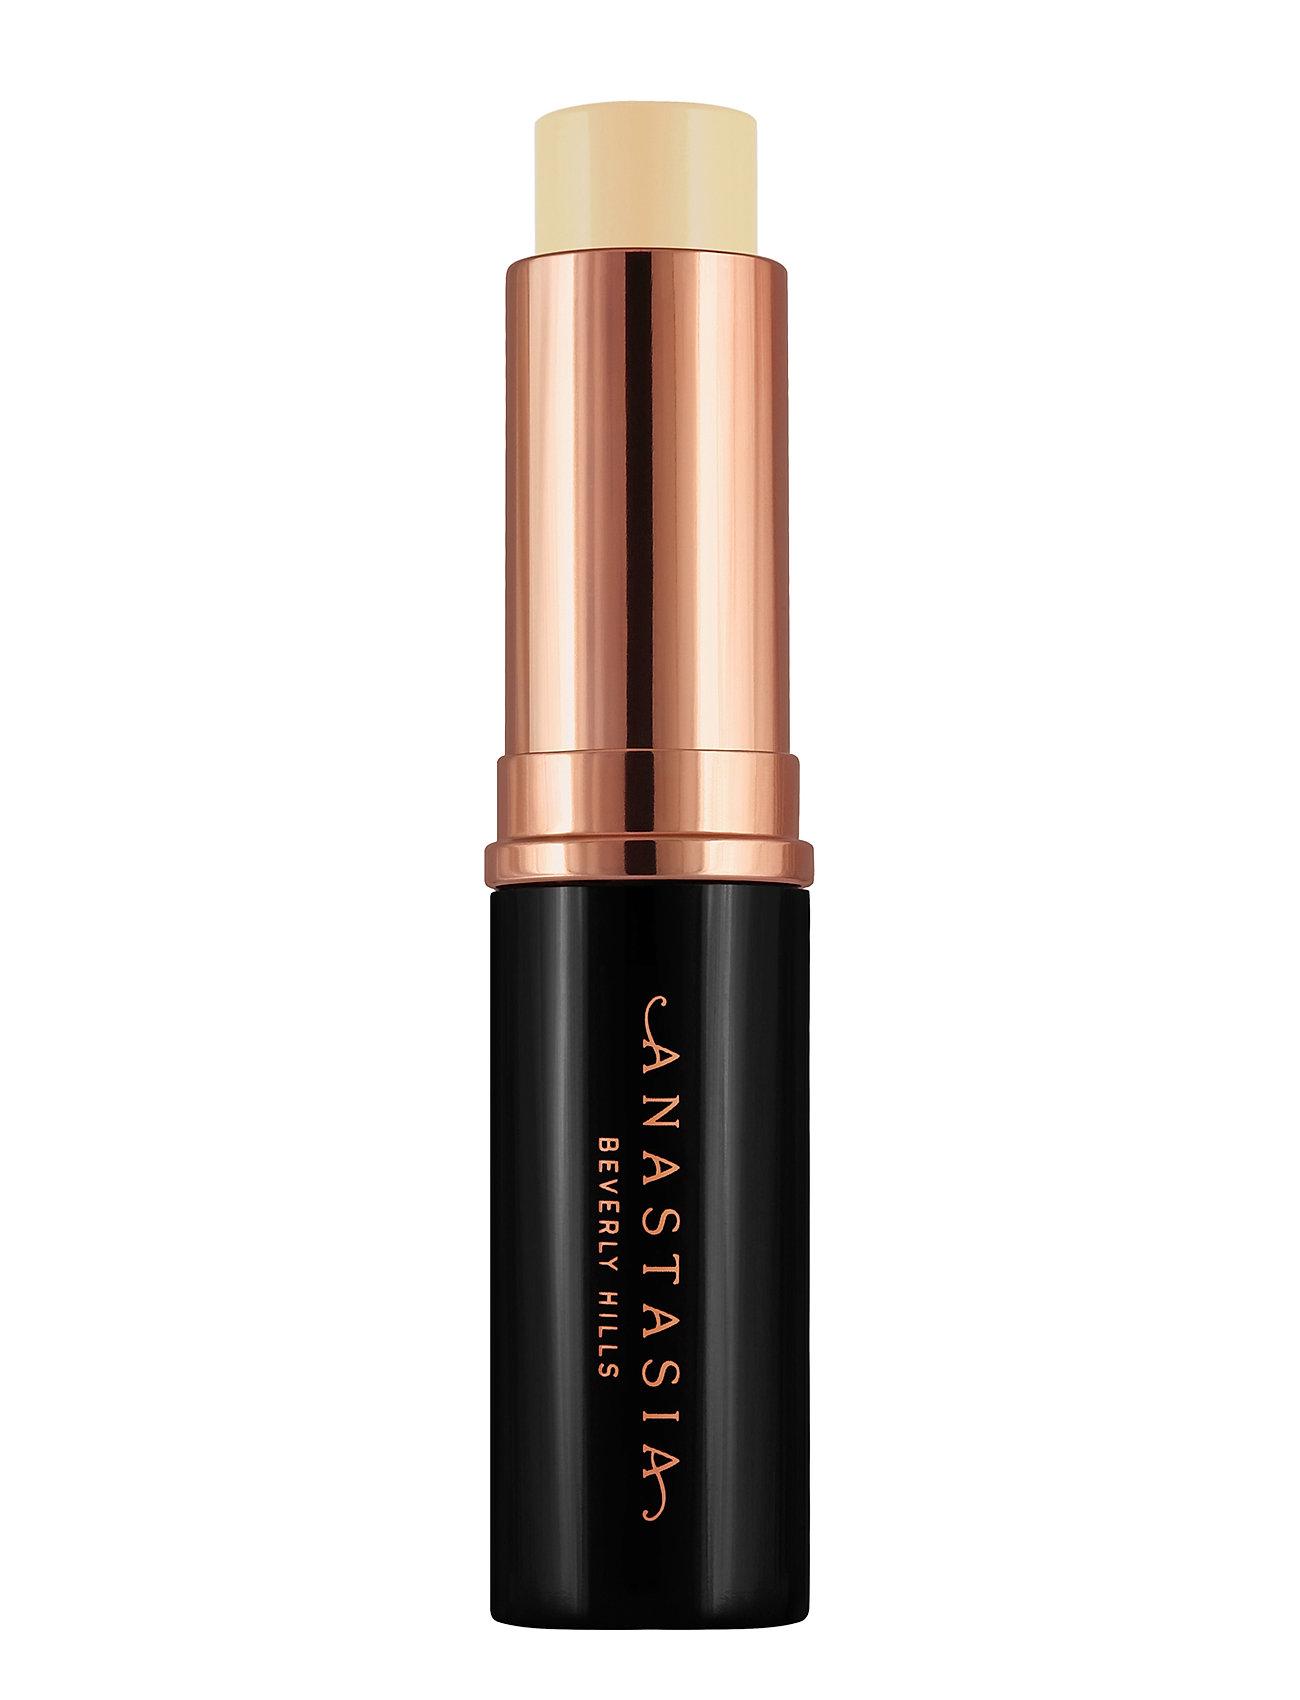 Image of Stick Foundation - Beige Foundation Makeup Anastasia Beverly Hills (3356555223)